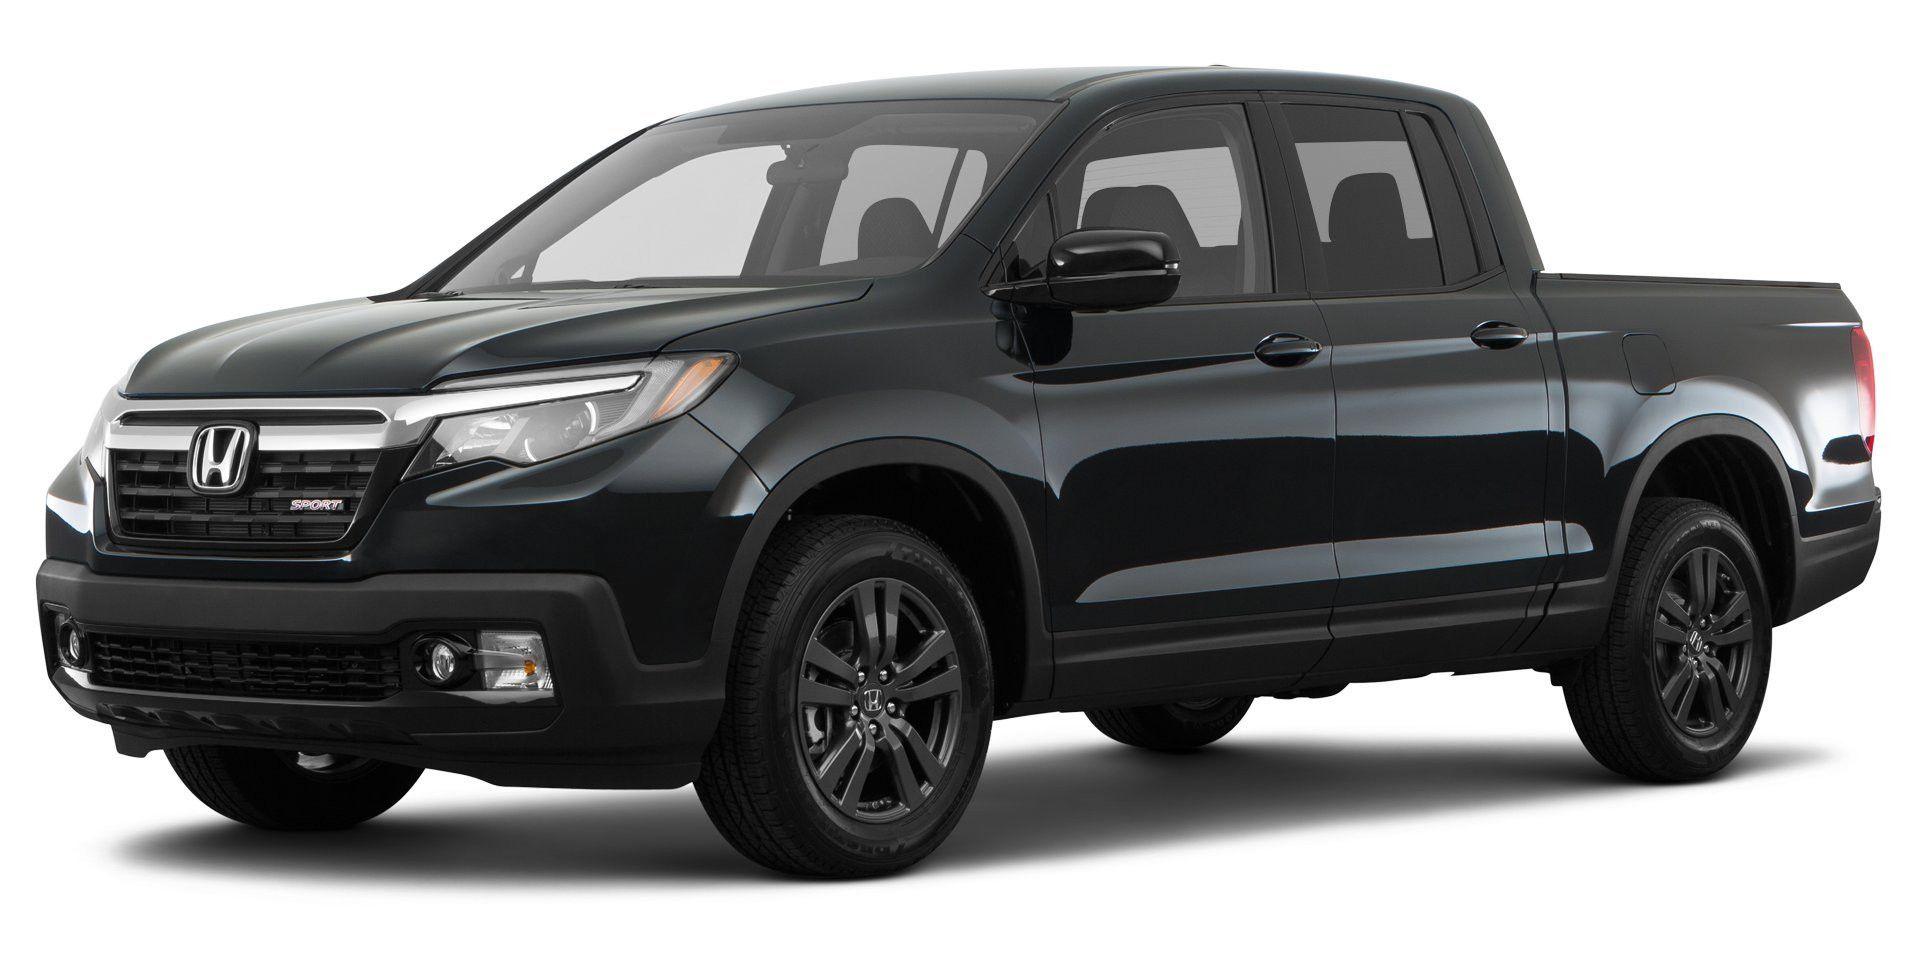 Russ Darrow Honda >> Amazon 2018 Honda Ridgeline Reviews and Specs Vehicles ...